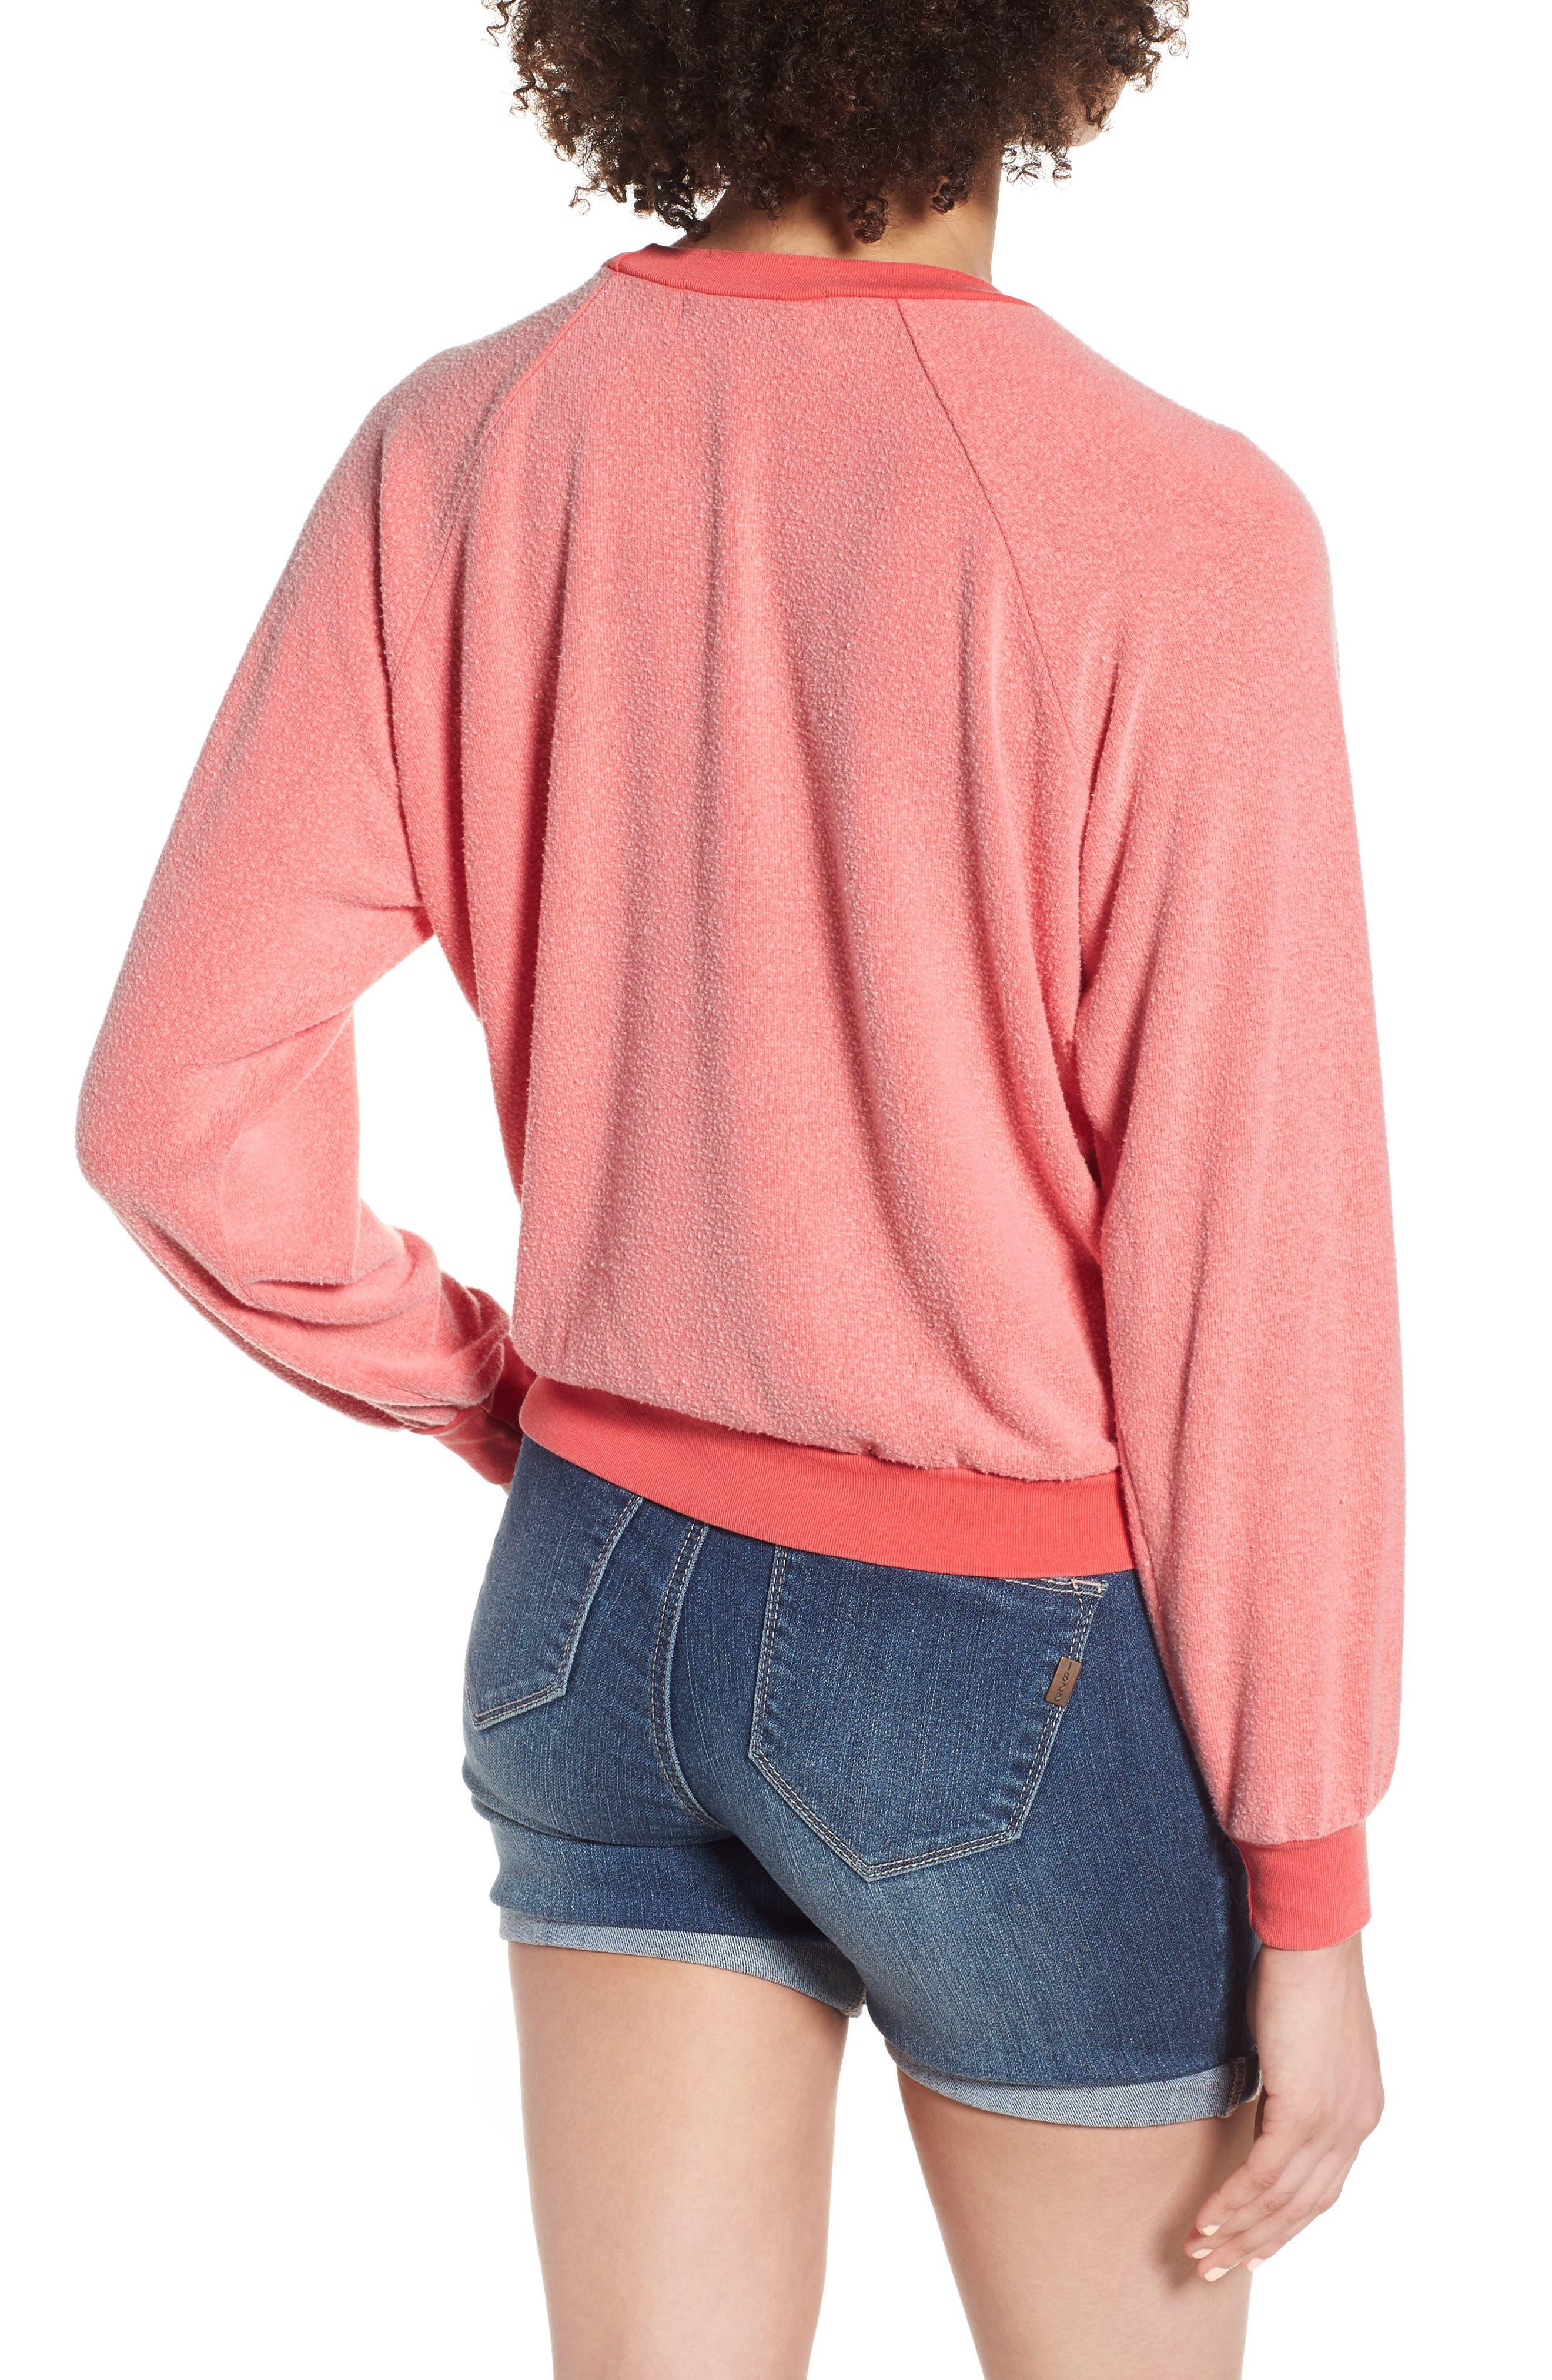 Caliente Junior Sweatshirt,                             Alternate thumbnail 2, color,                             Pigment Hot Lipstick